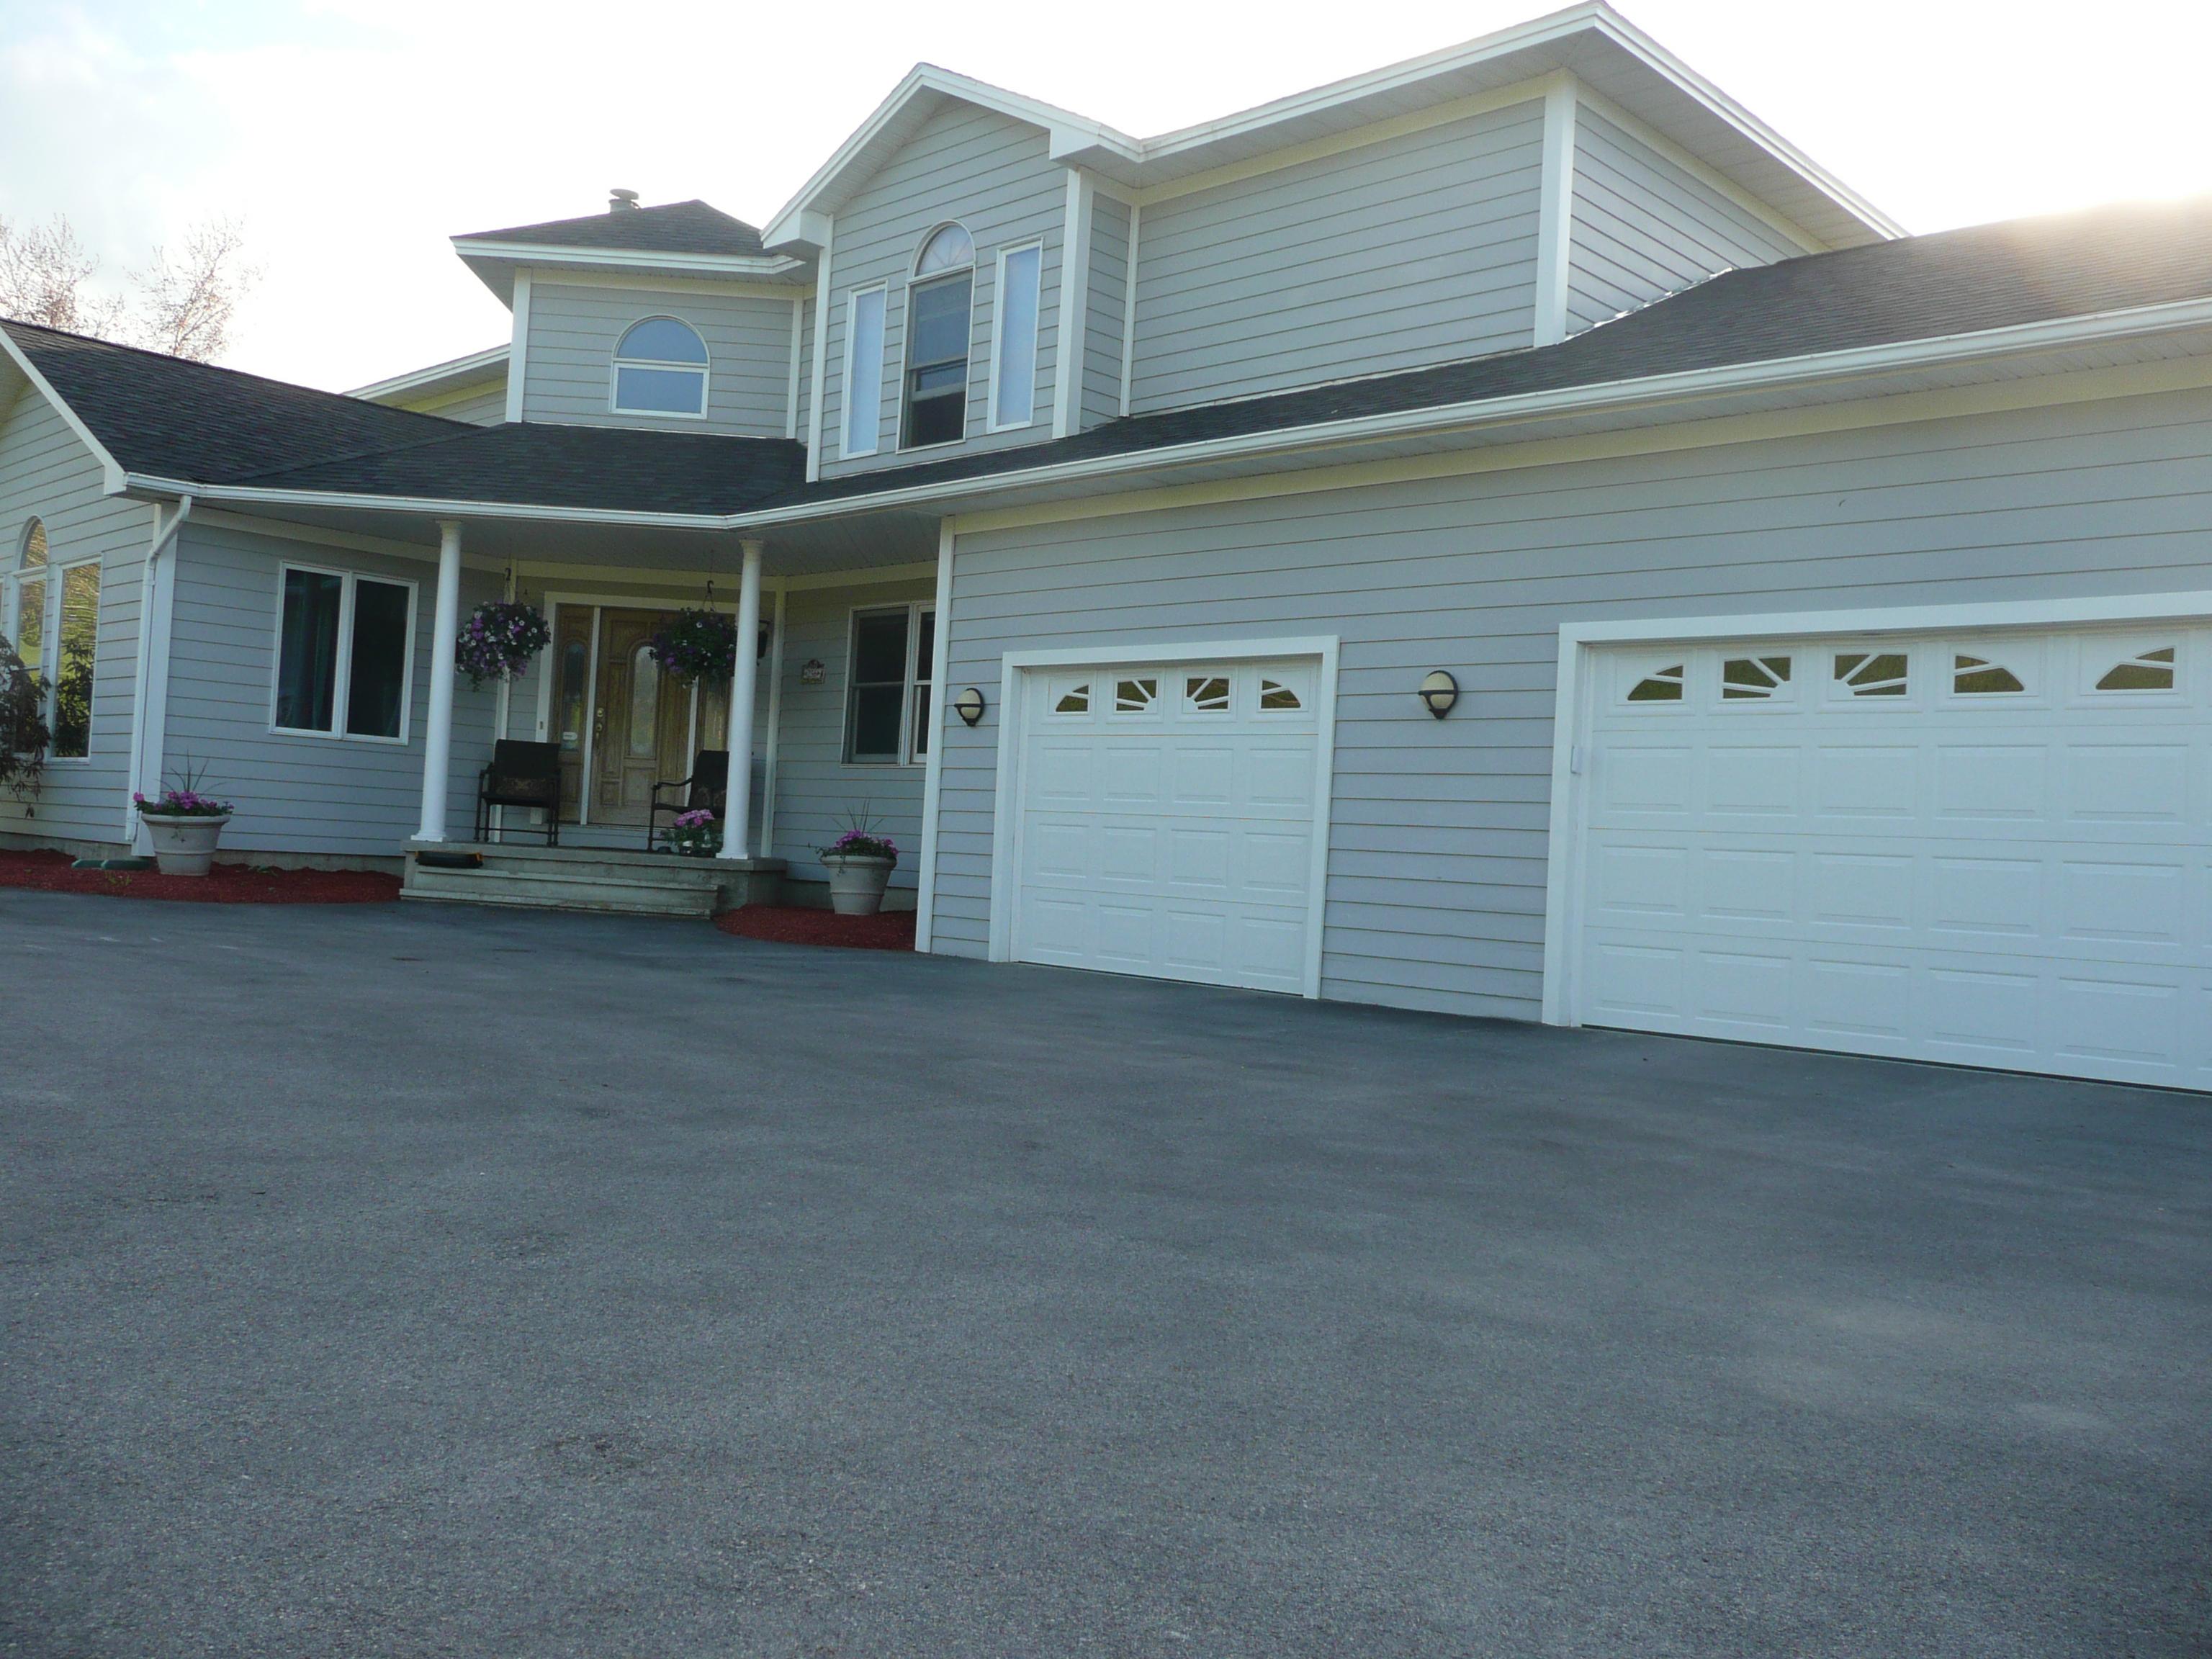 獨棟家庭住宅 為 出售 在 256 Hillside Ter, St. Albans Town St. Albans, 佛蒙特州 05478 美國